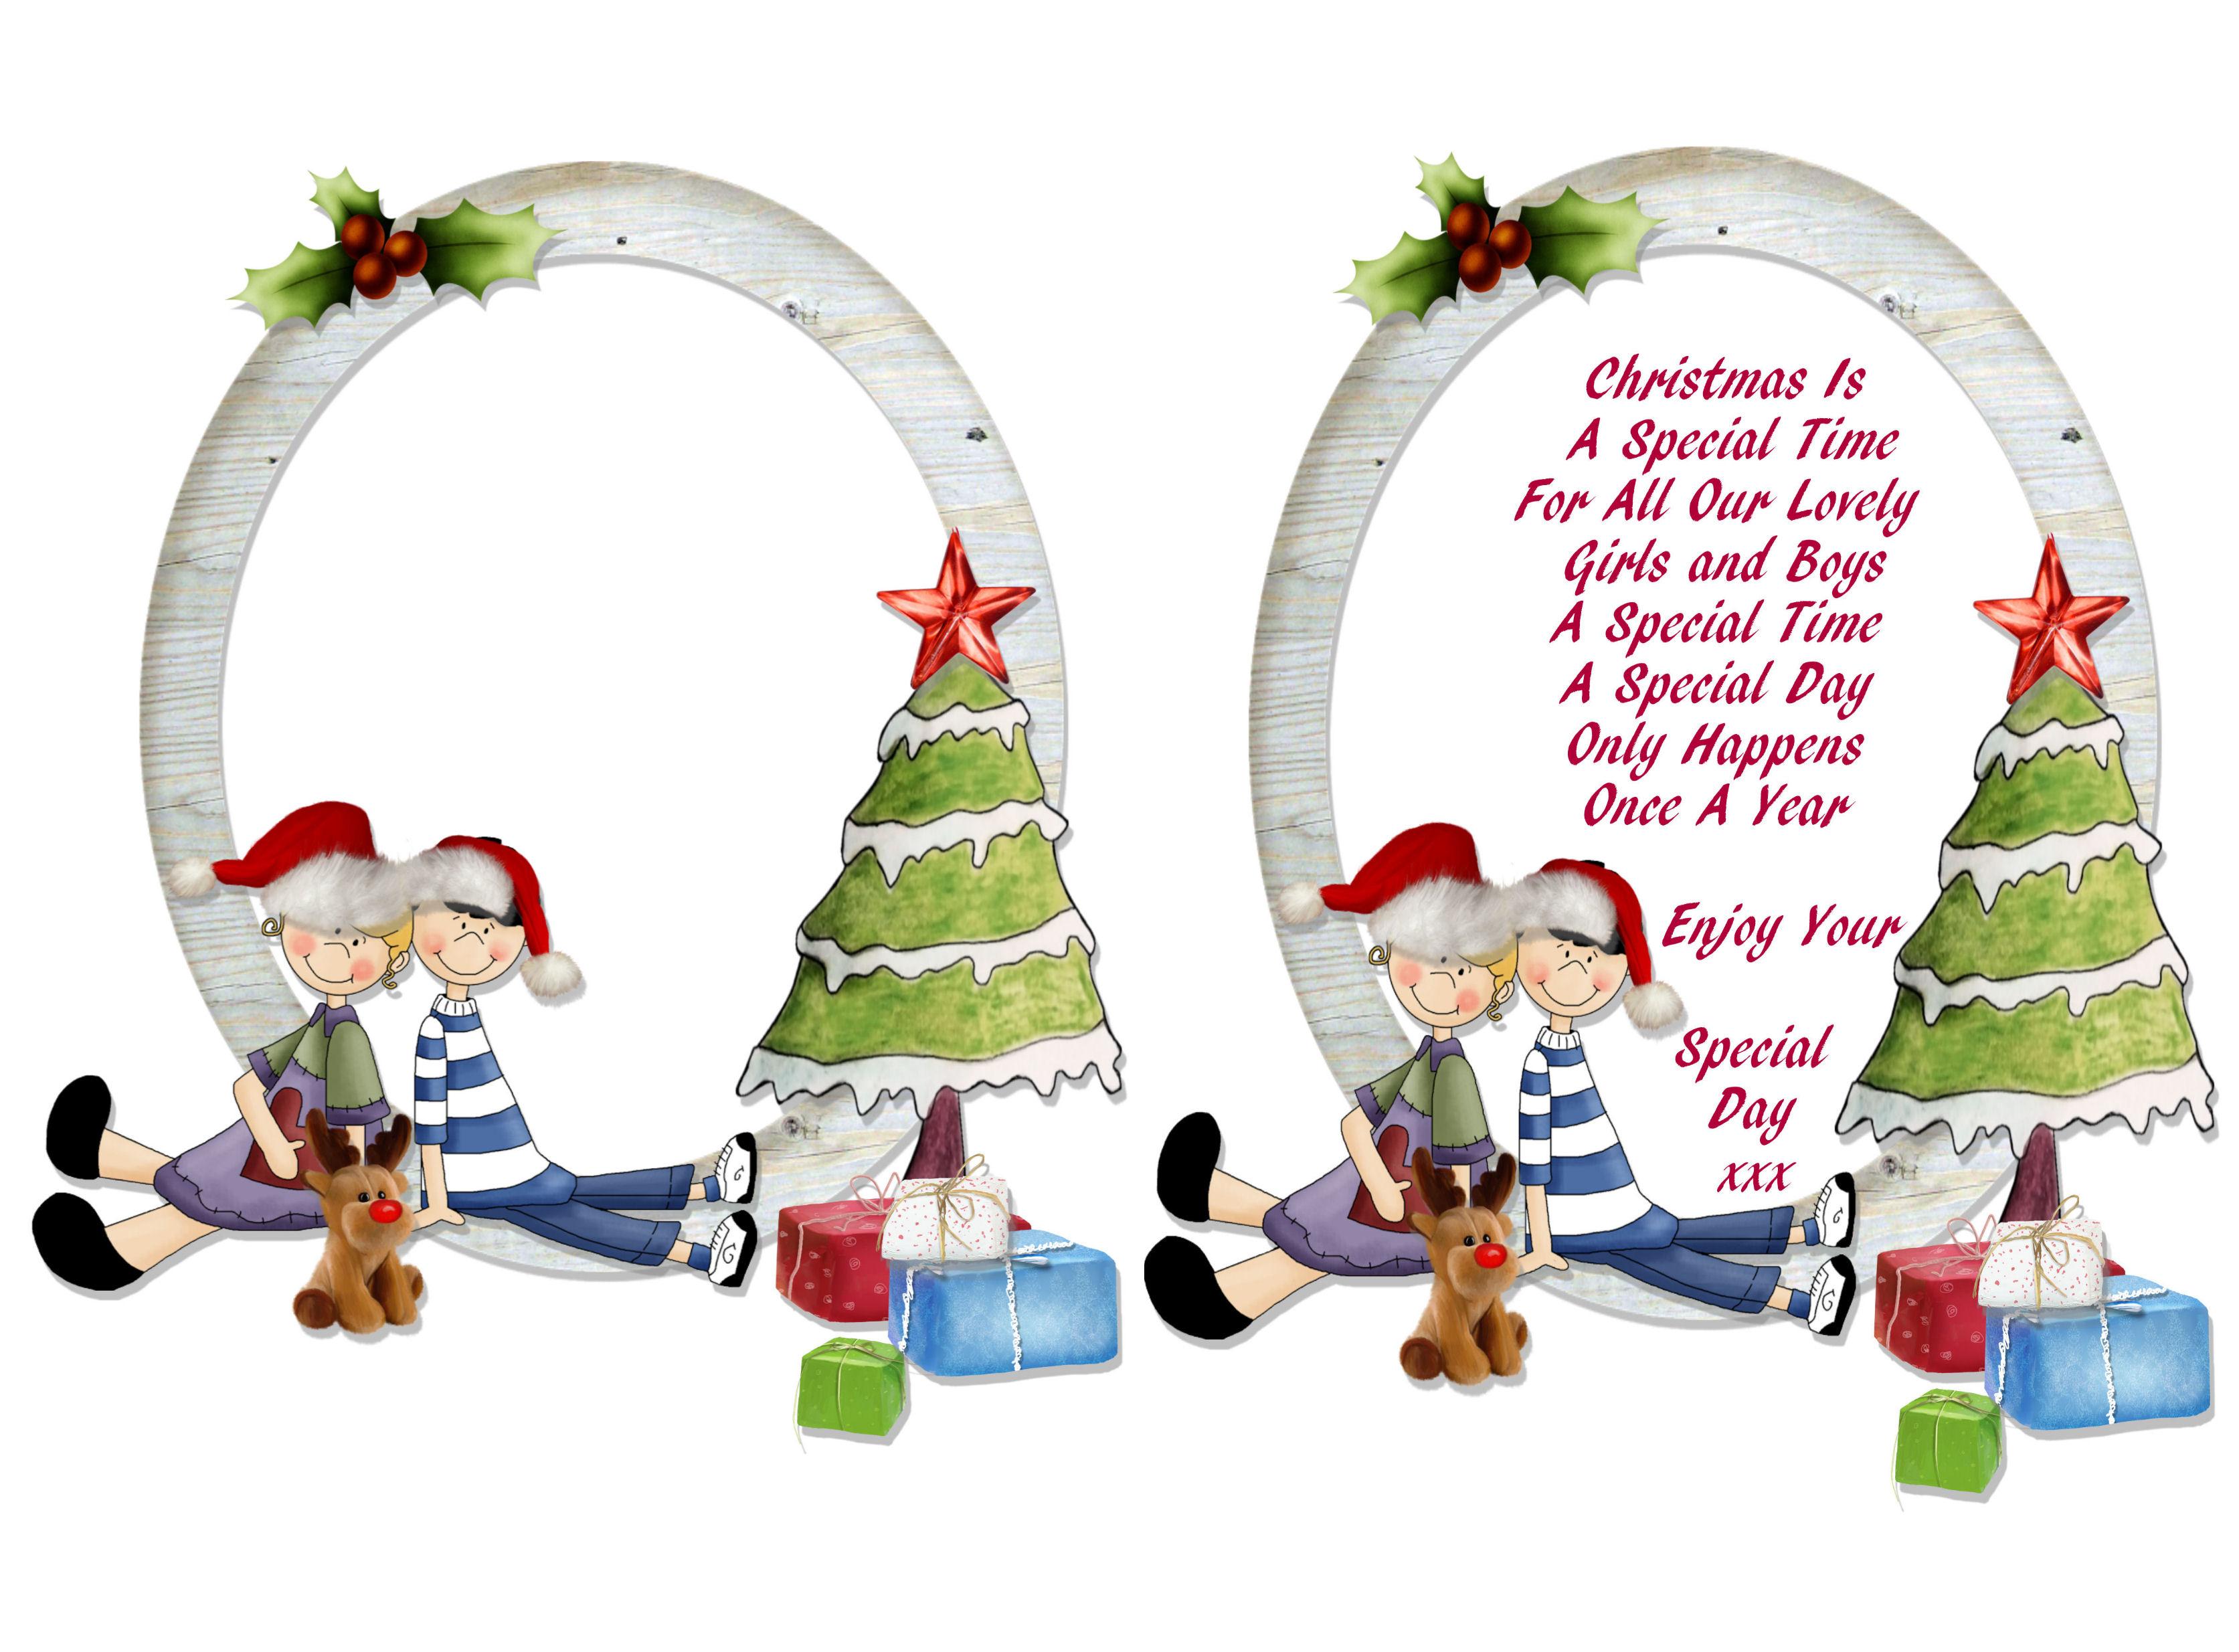 Christian Christmas Cards Free Printable – Festival Collections - Free Printable Christian Christmas Greeting Cards